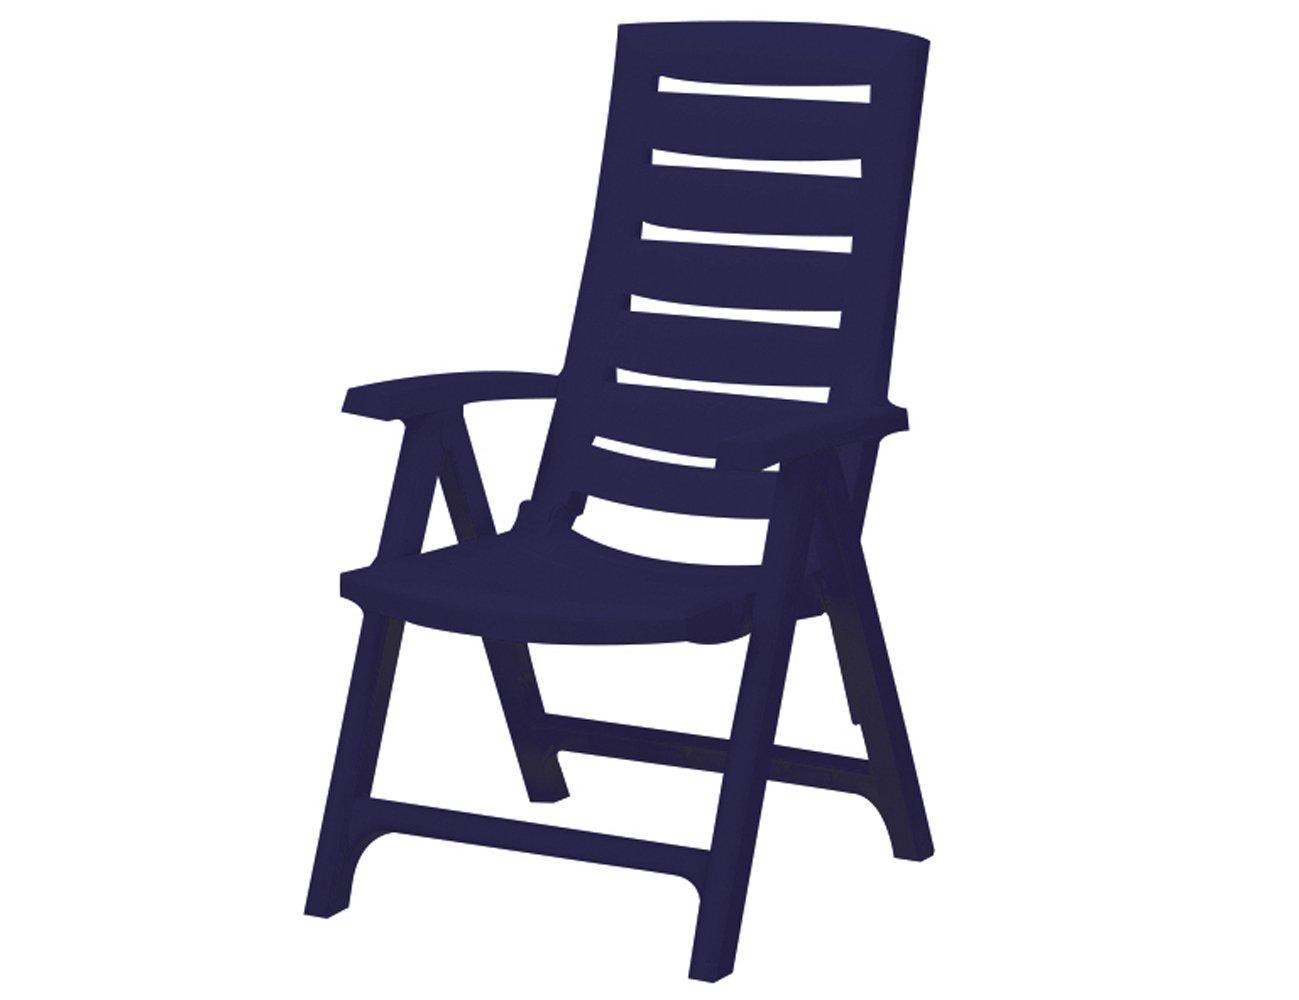 Jardin 212167 Klappsessel Aruba, verstellbar in 4 Positionen, Kunststoff, blau